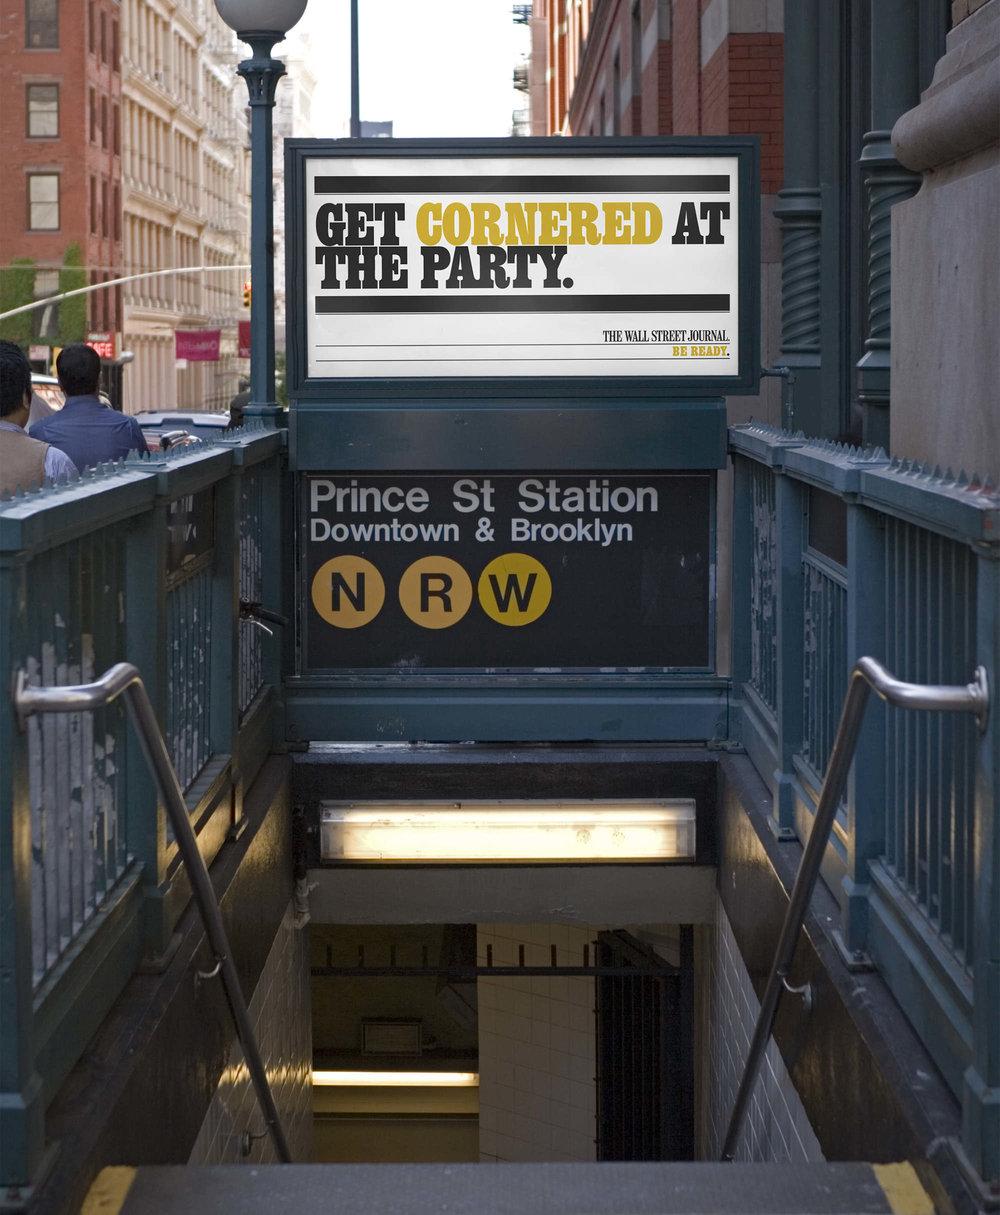 Subway_Entrance_2000px_2000_c.jpg